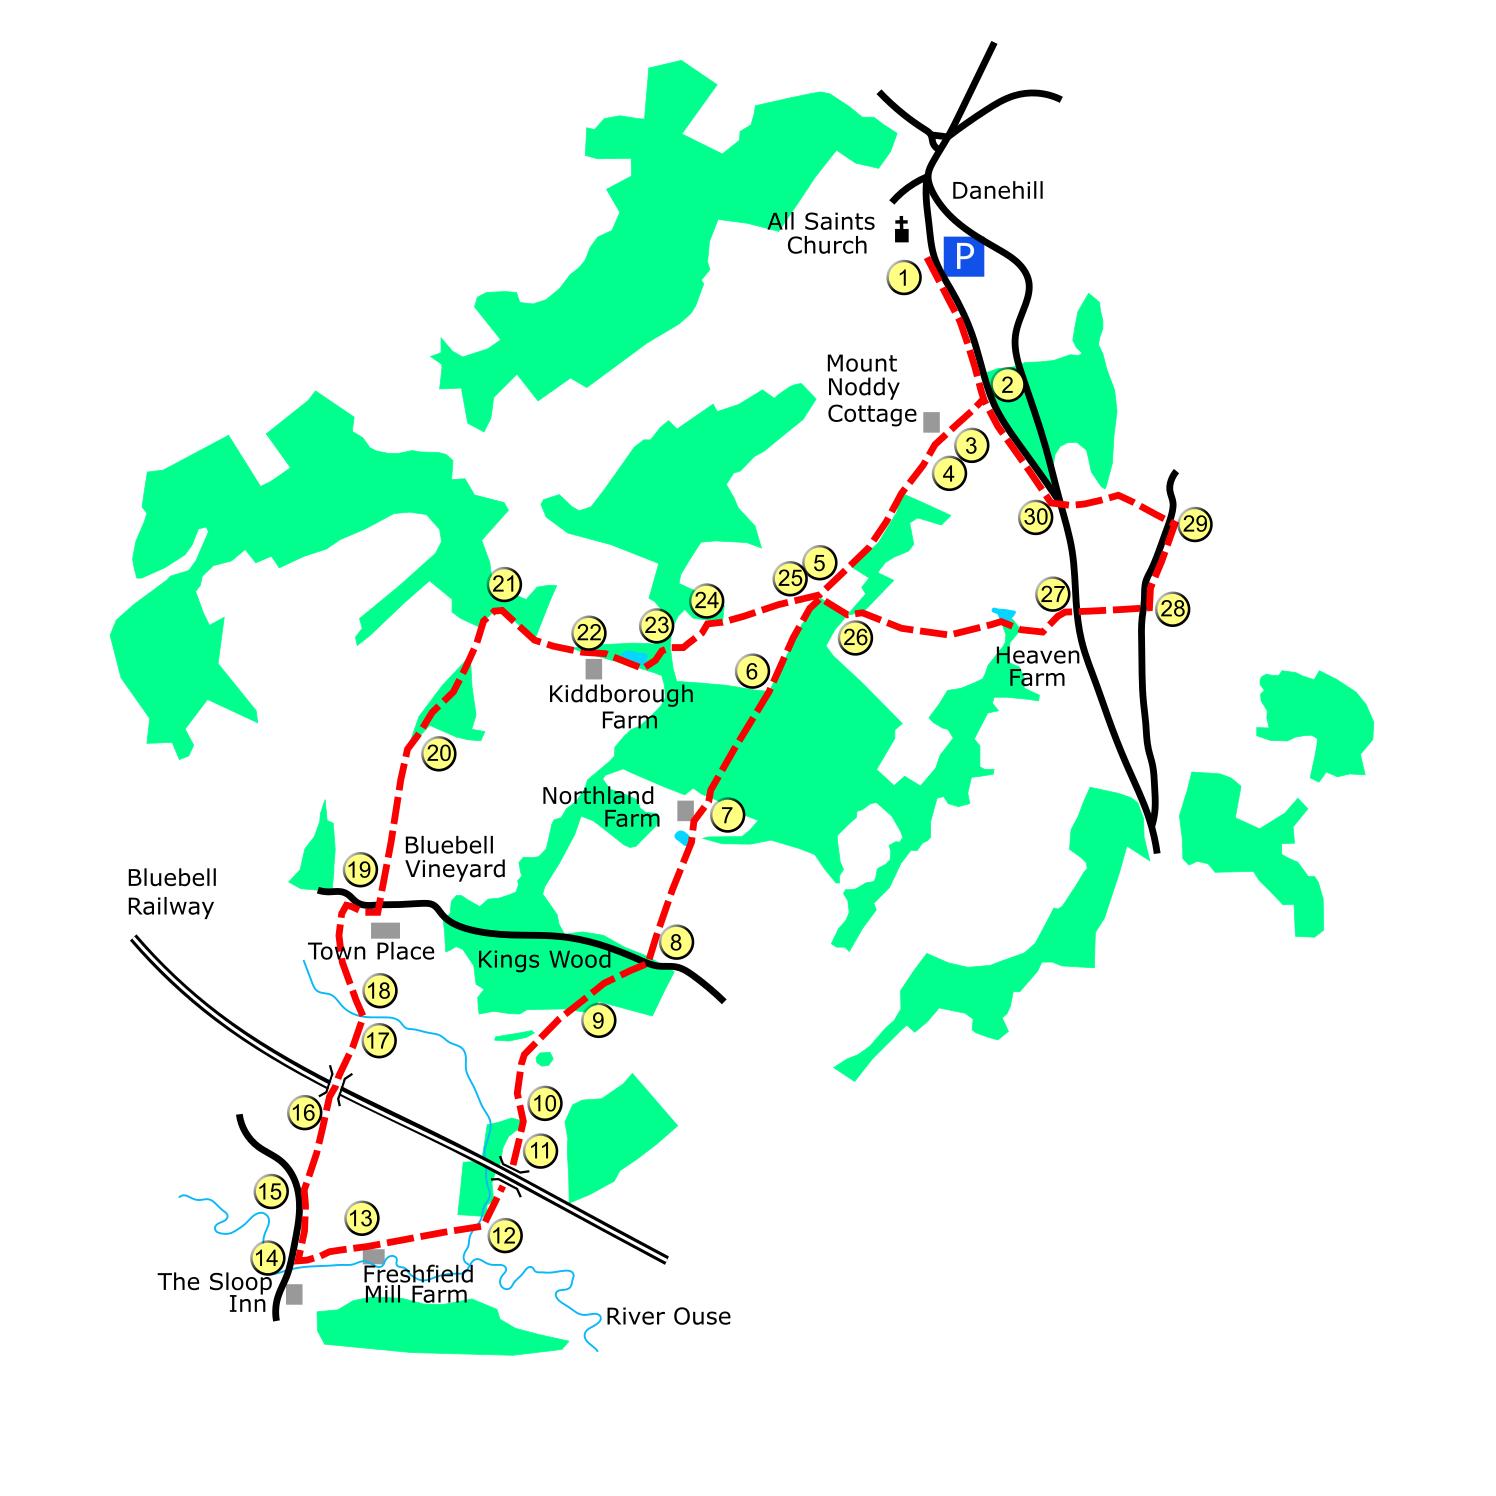 Danehill route map